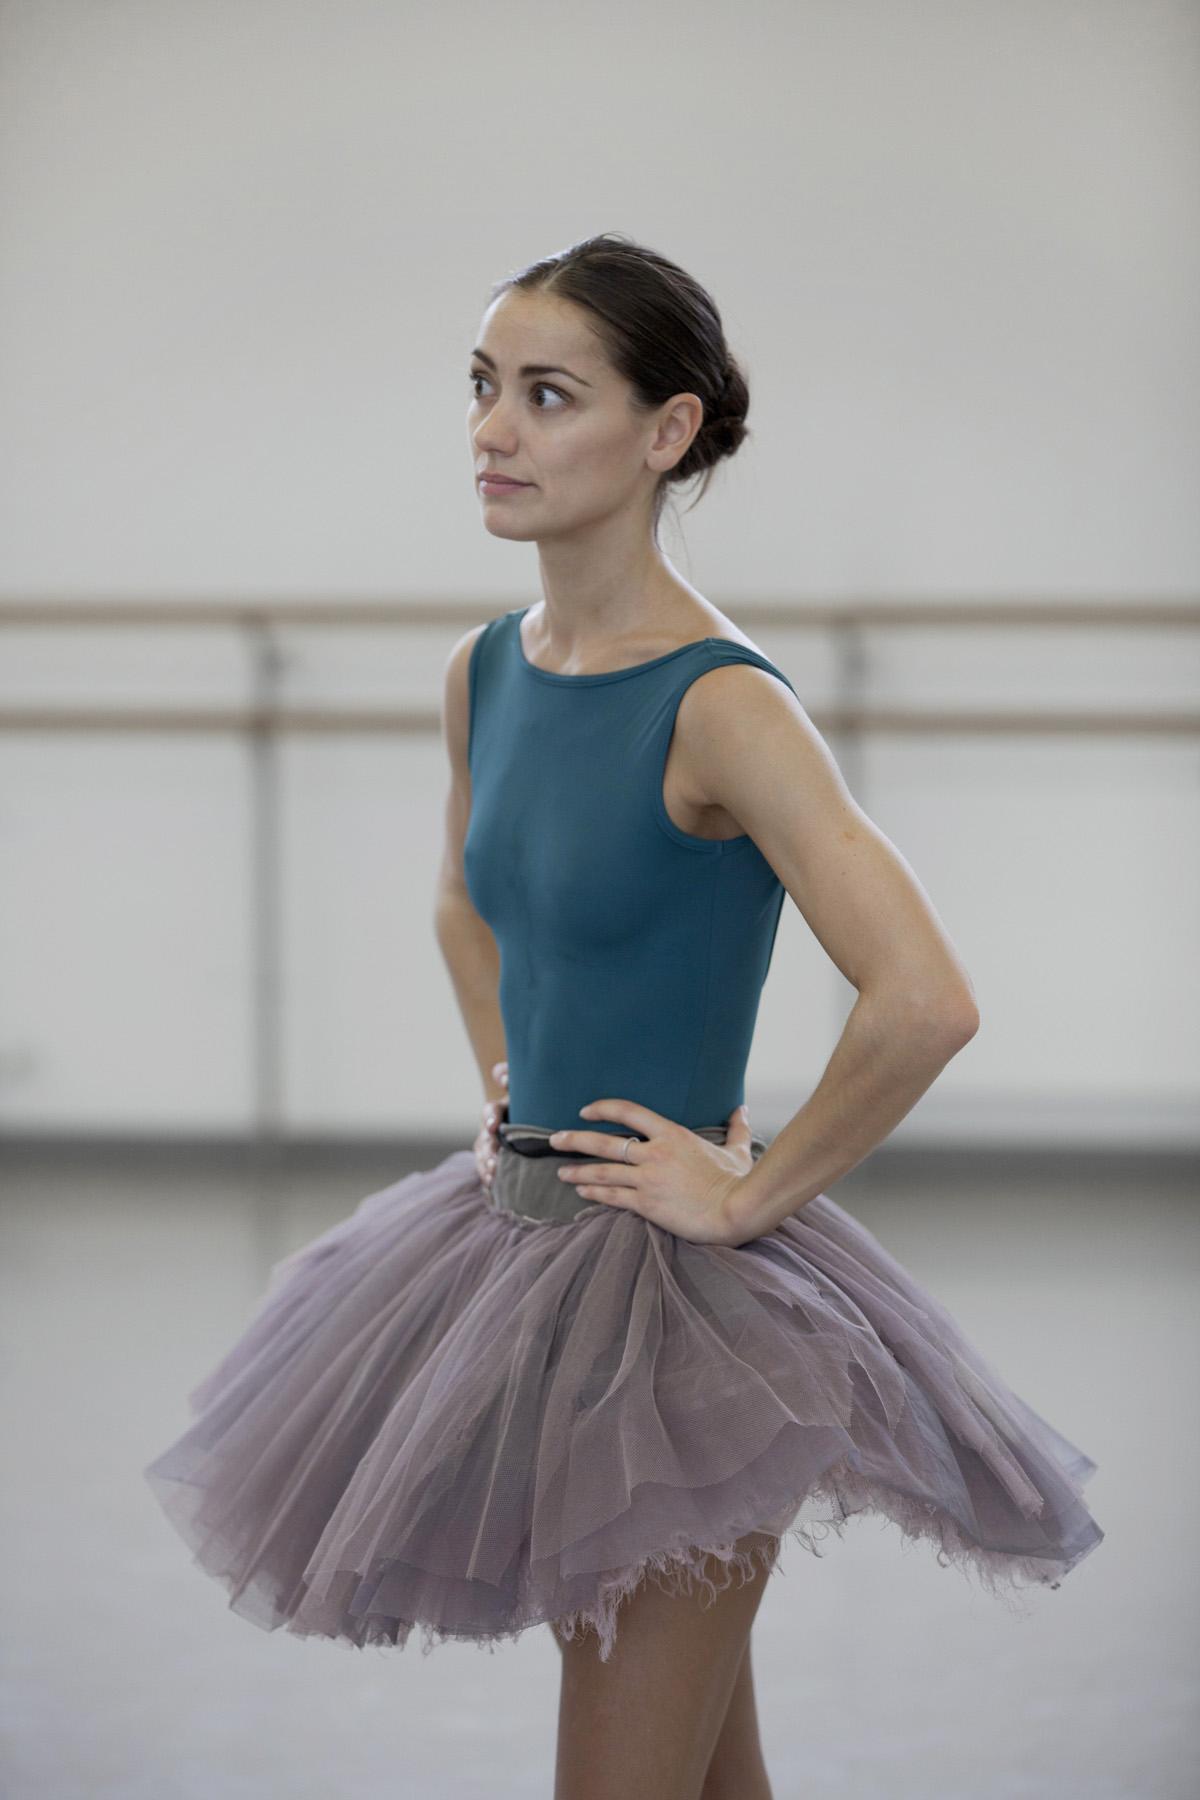 scottish ballet - the nutcracker_0408.jpeg